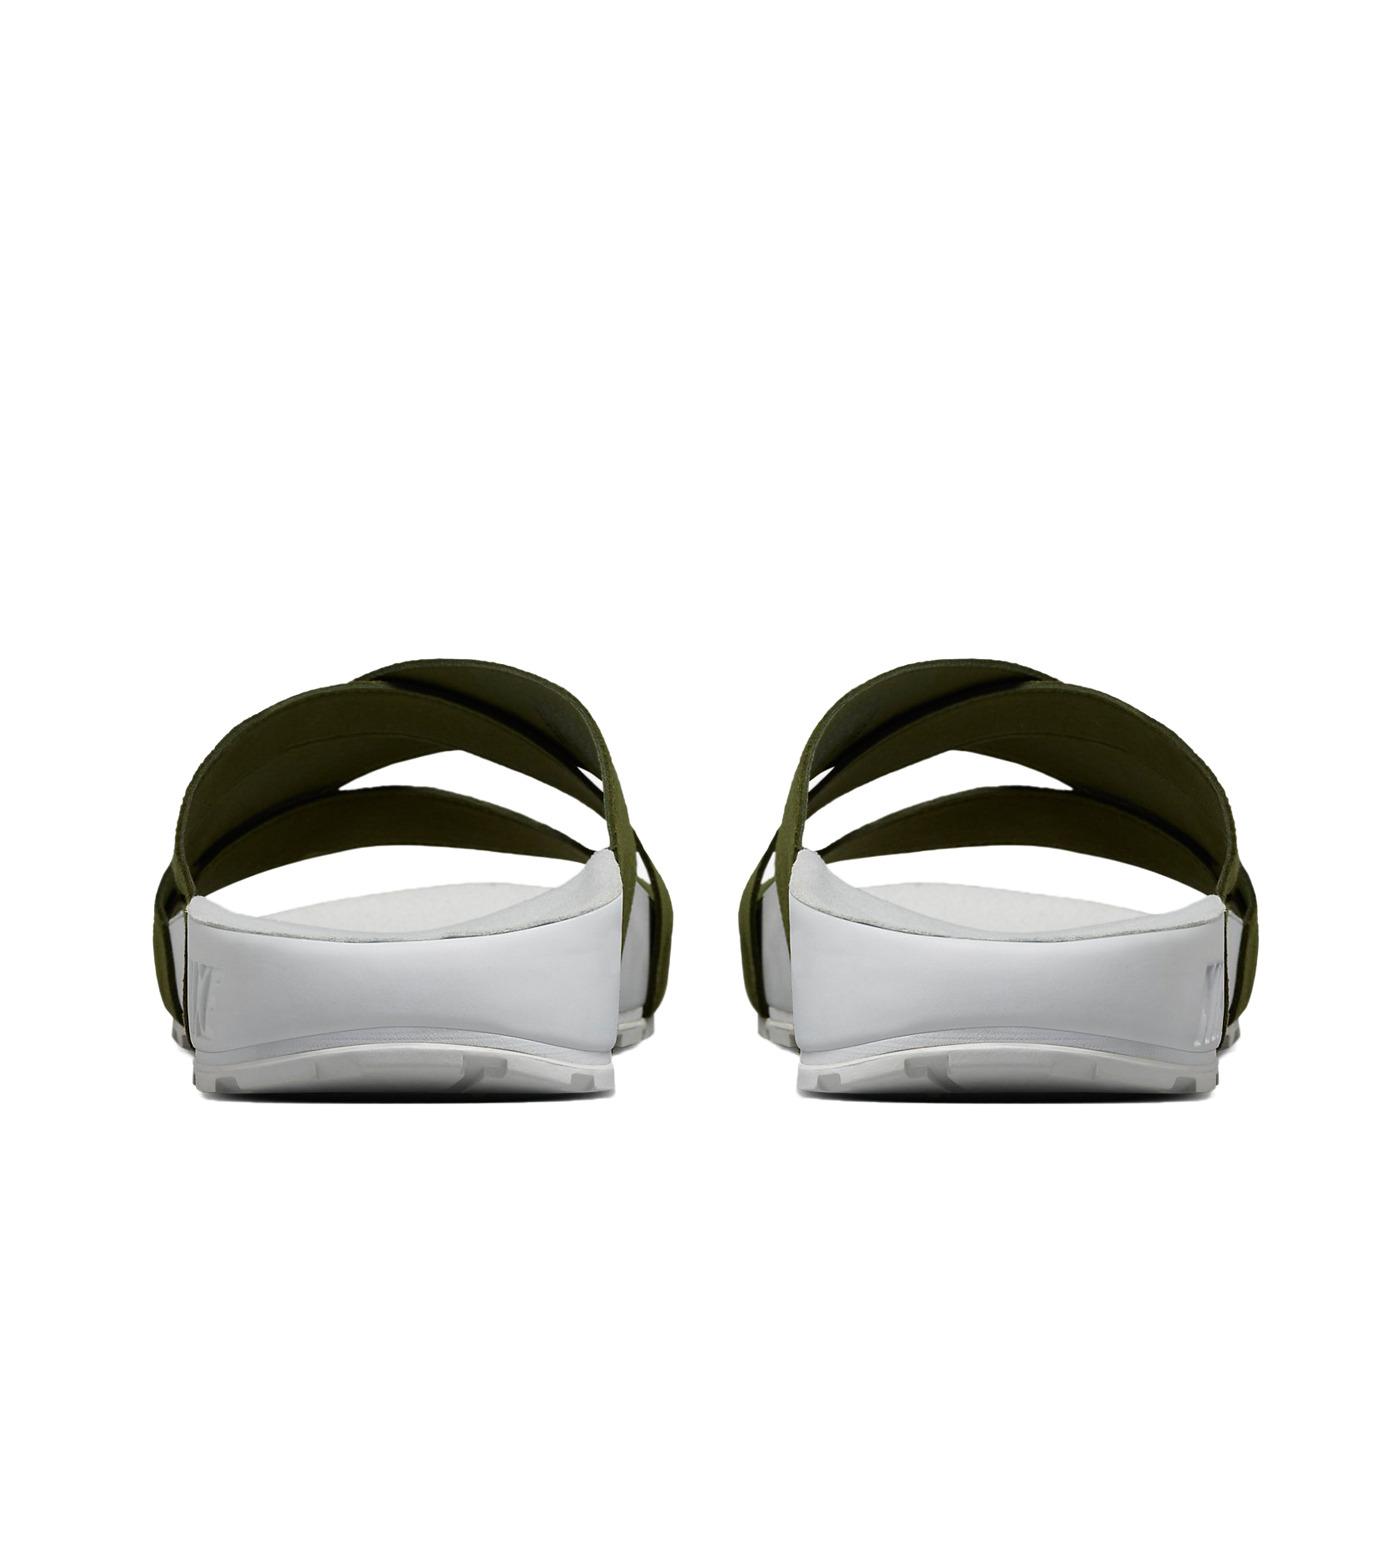 NIKE(ナイキ)のTAUPO-GREEN(シューズ/shoes)-849756-310-22 拡大詳細画像5